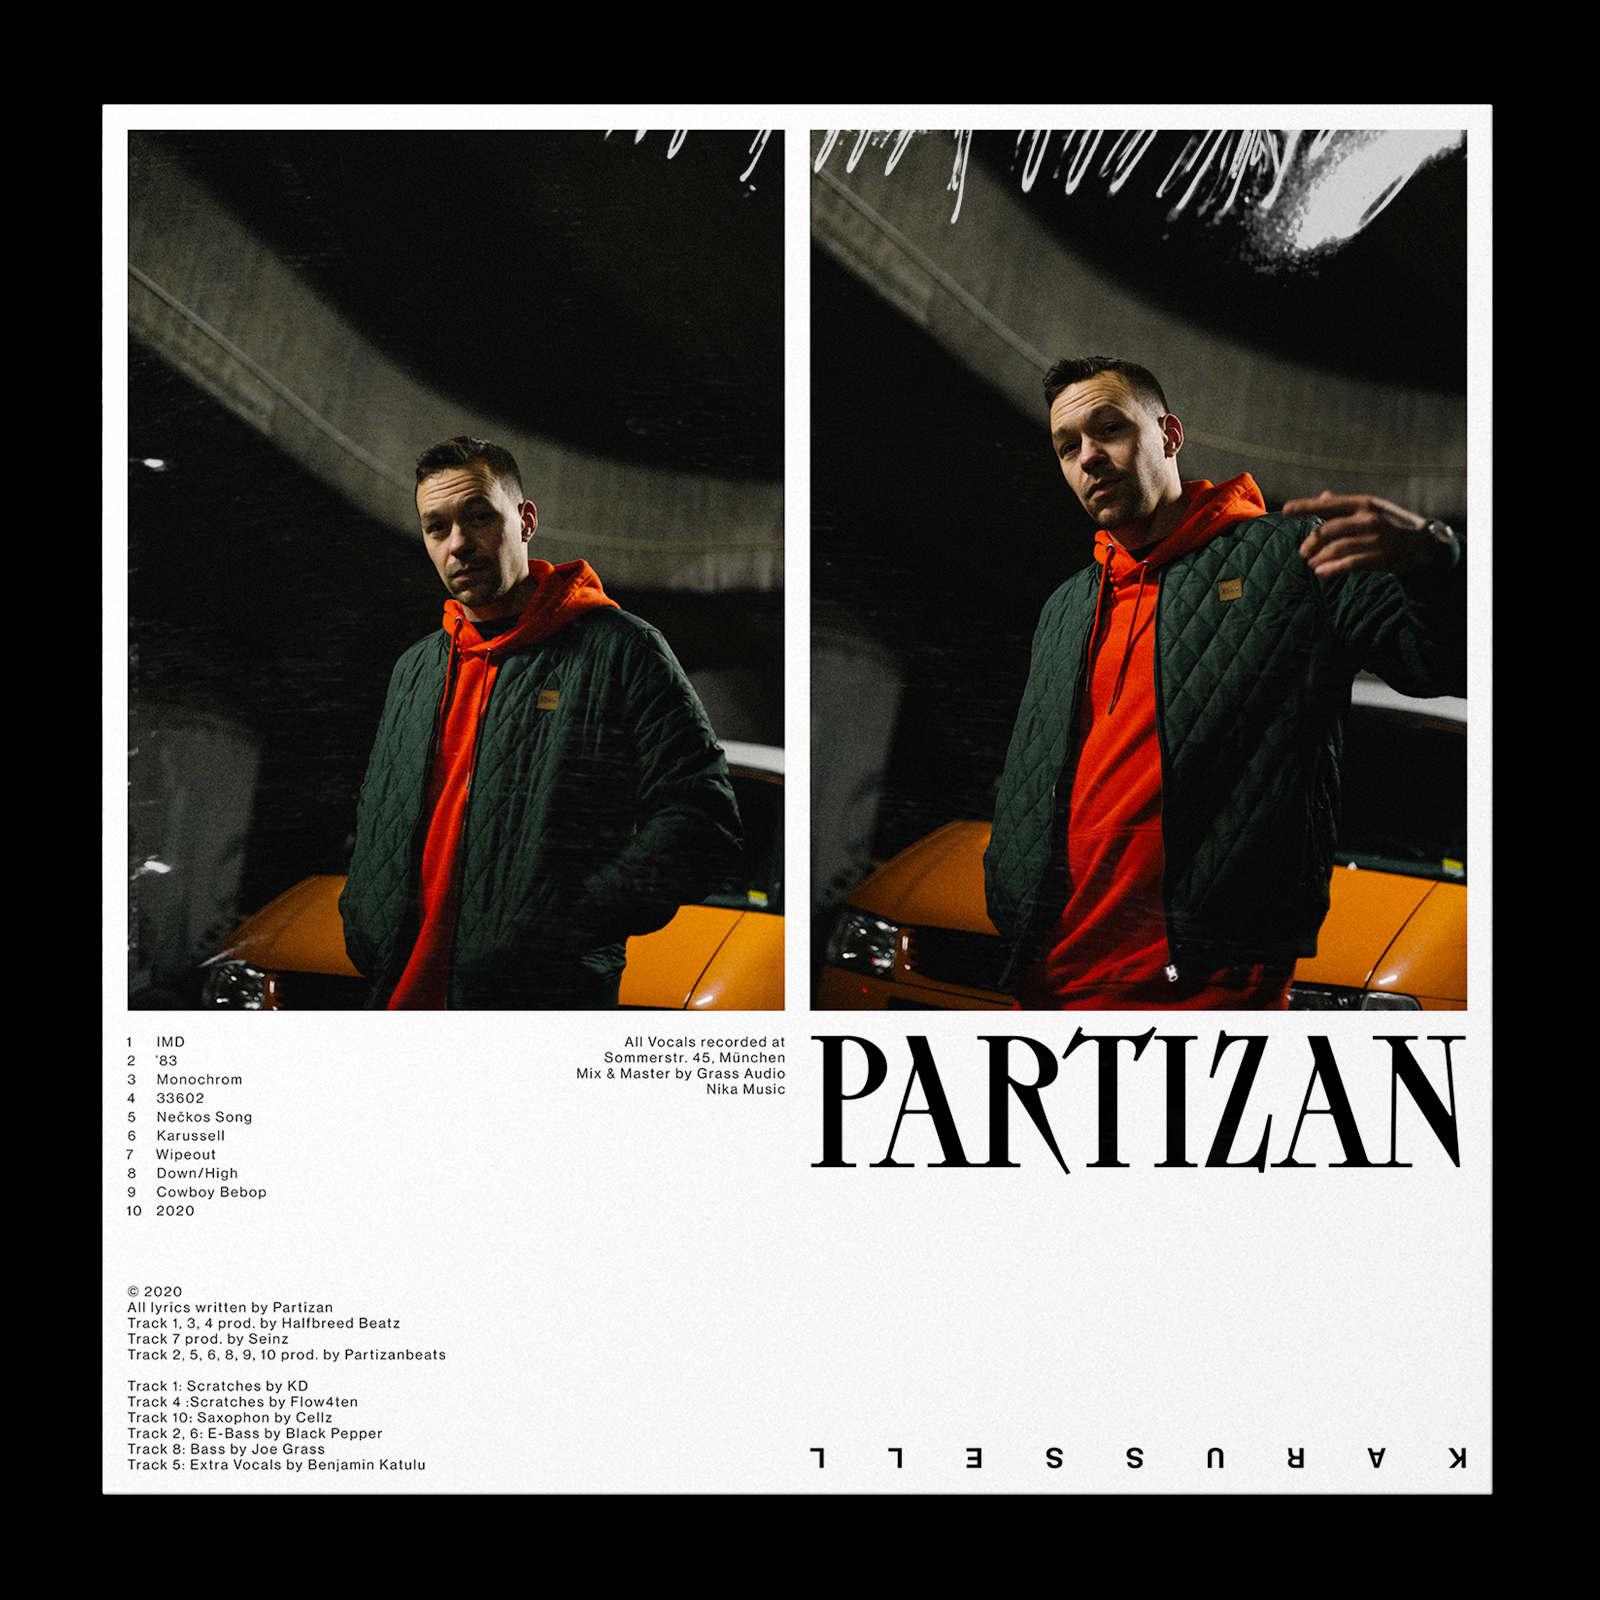 Upcoming: Partizan - Karussell LP